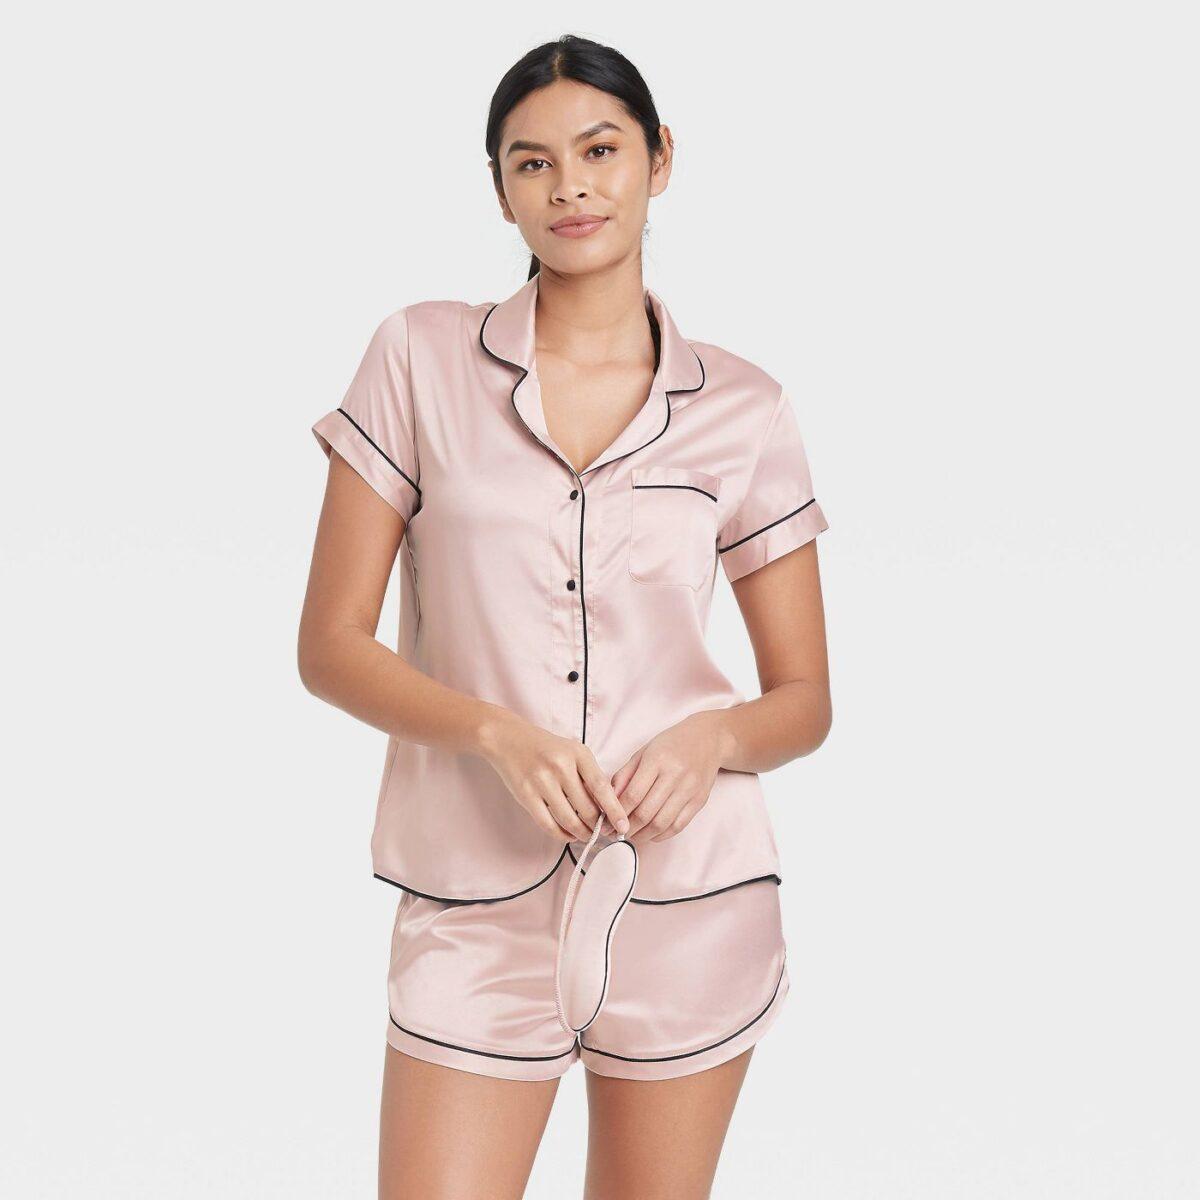 Women's 3pc Satin Notch Collar Top Pajama Set - Stars Above™